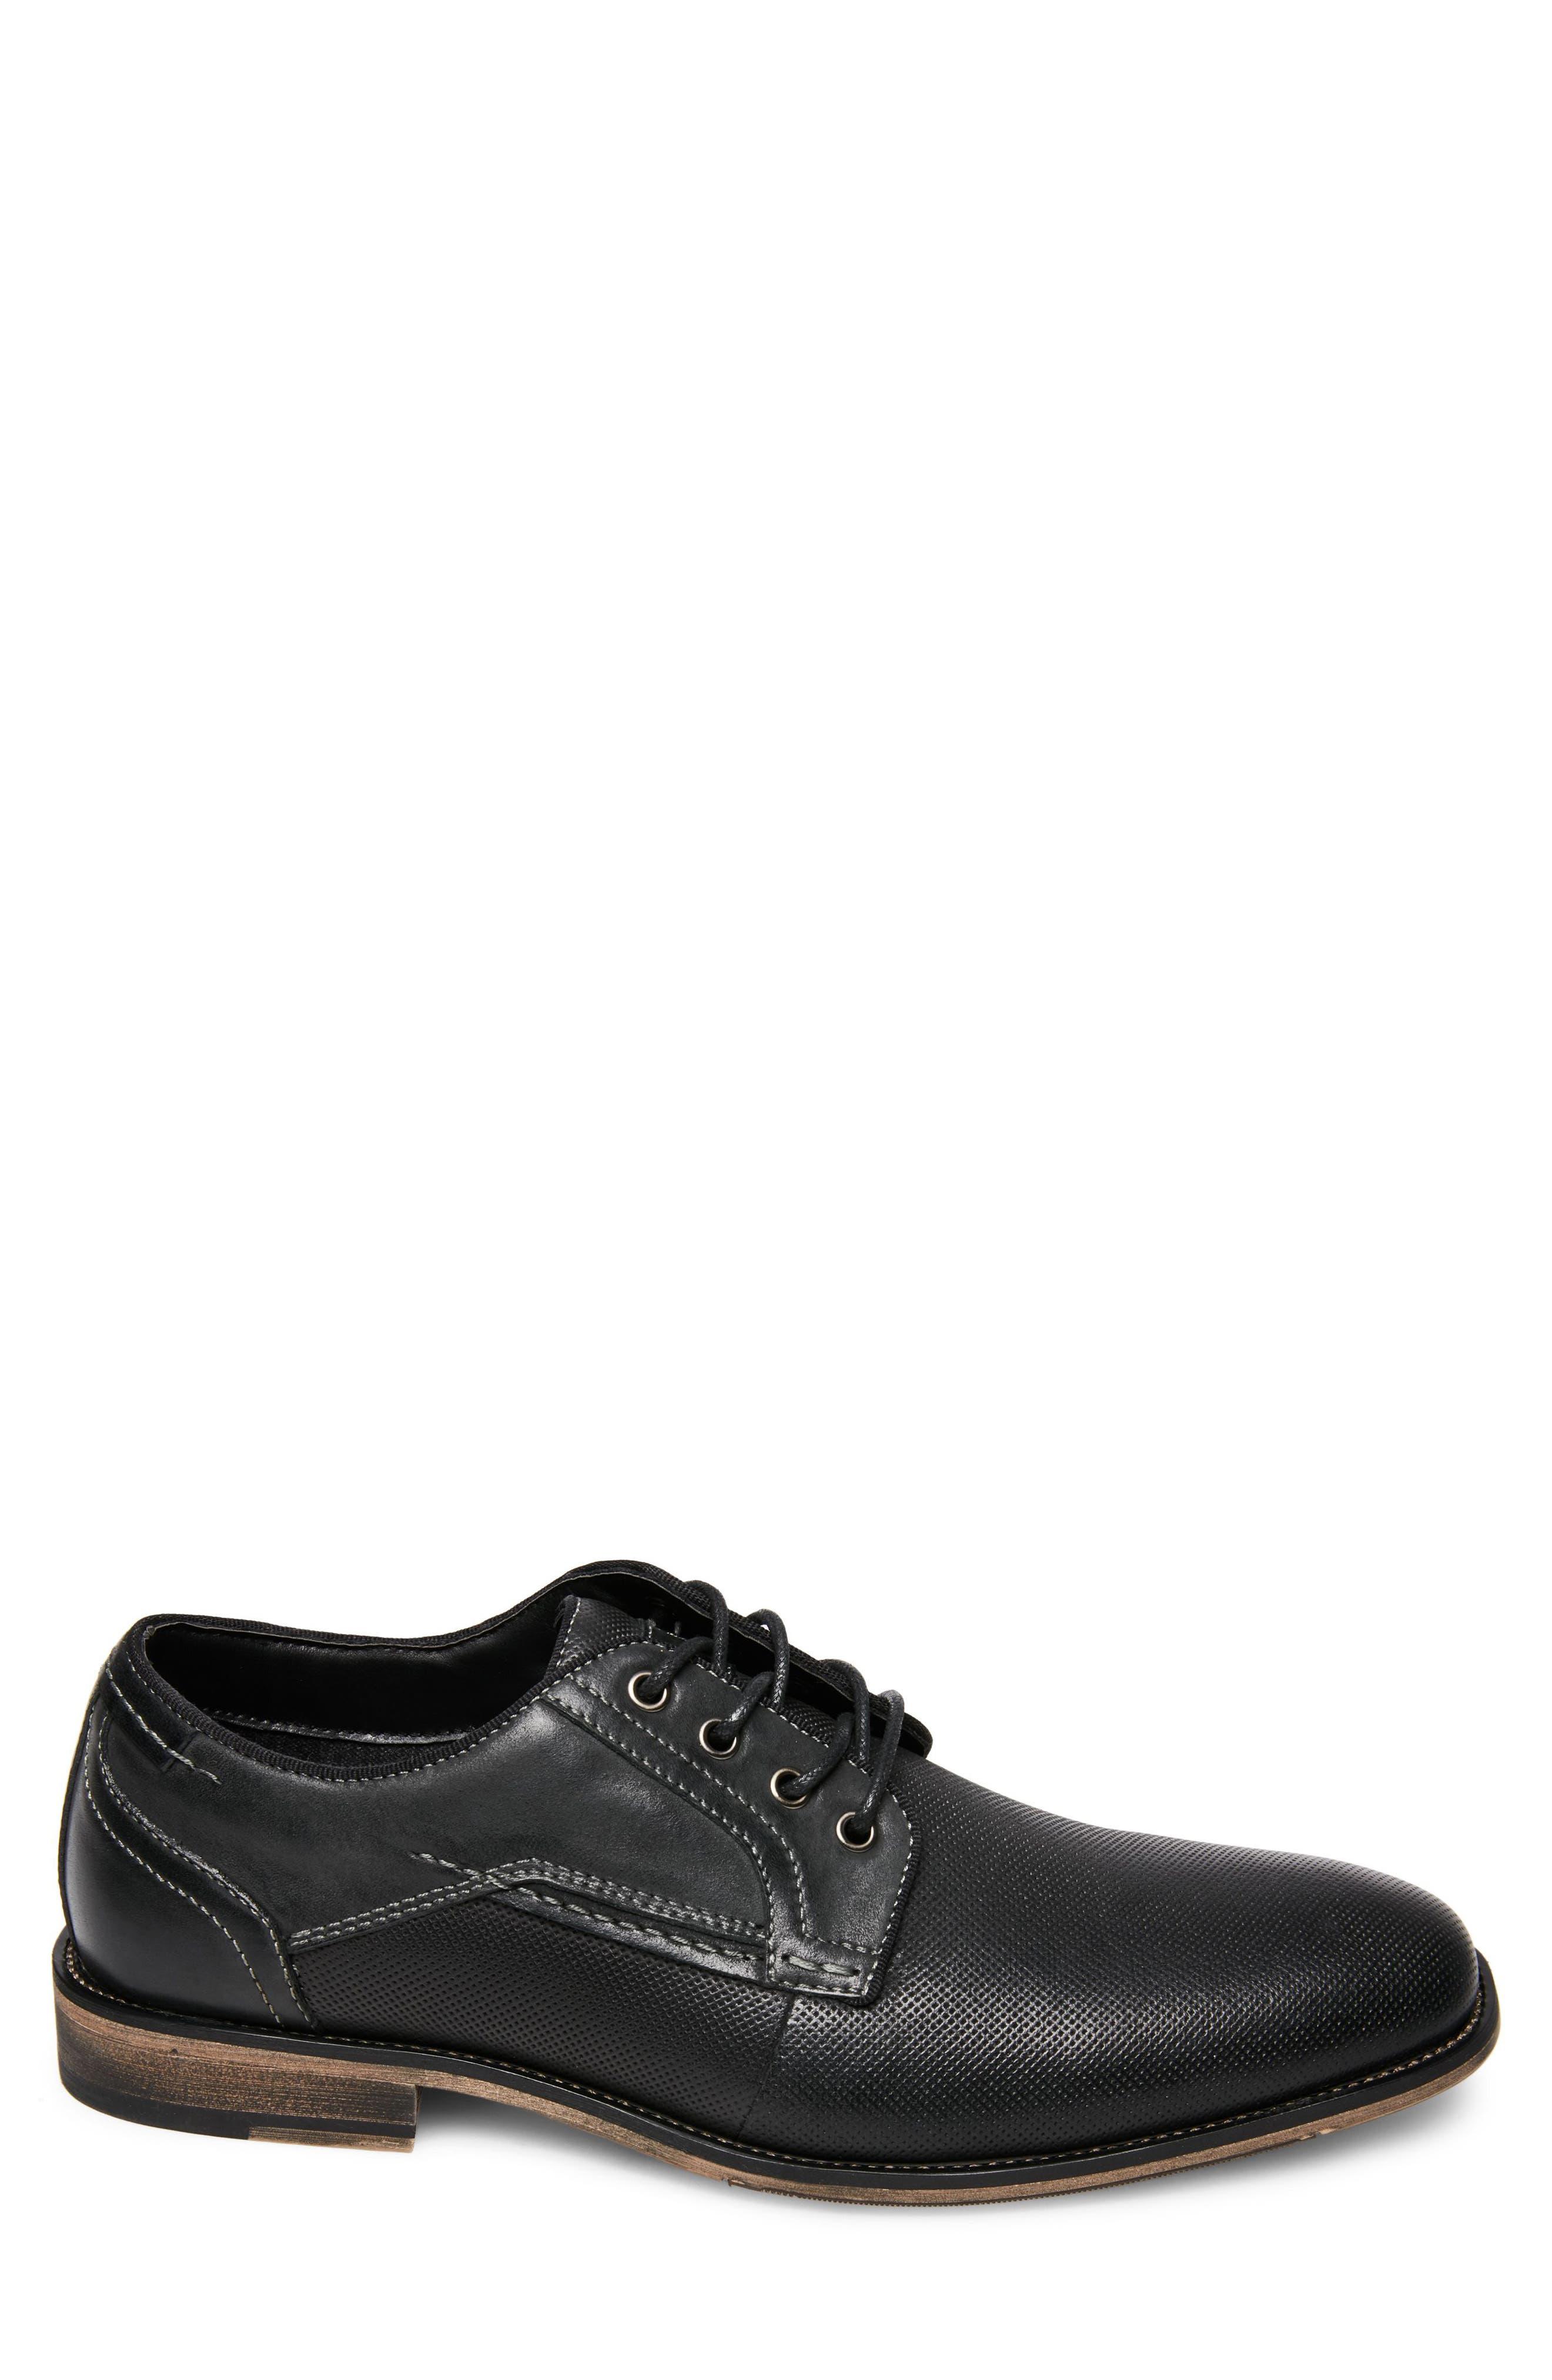 Jaysun Embossed Plain Toe Derby,                             Alternate thumbnail 3, color,                             Dark Grey Leather